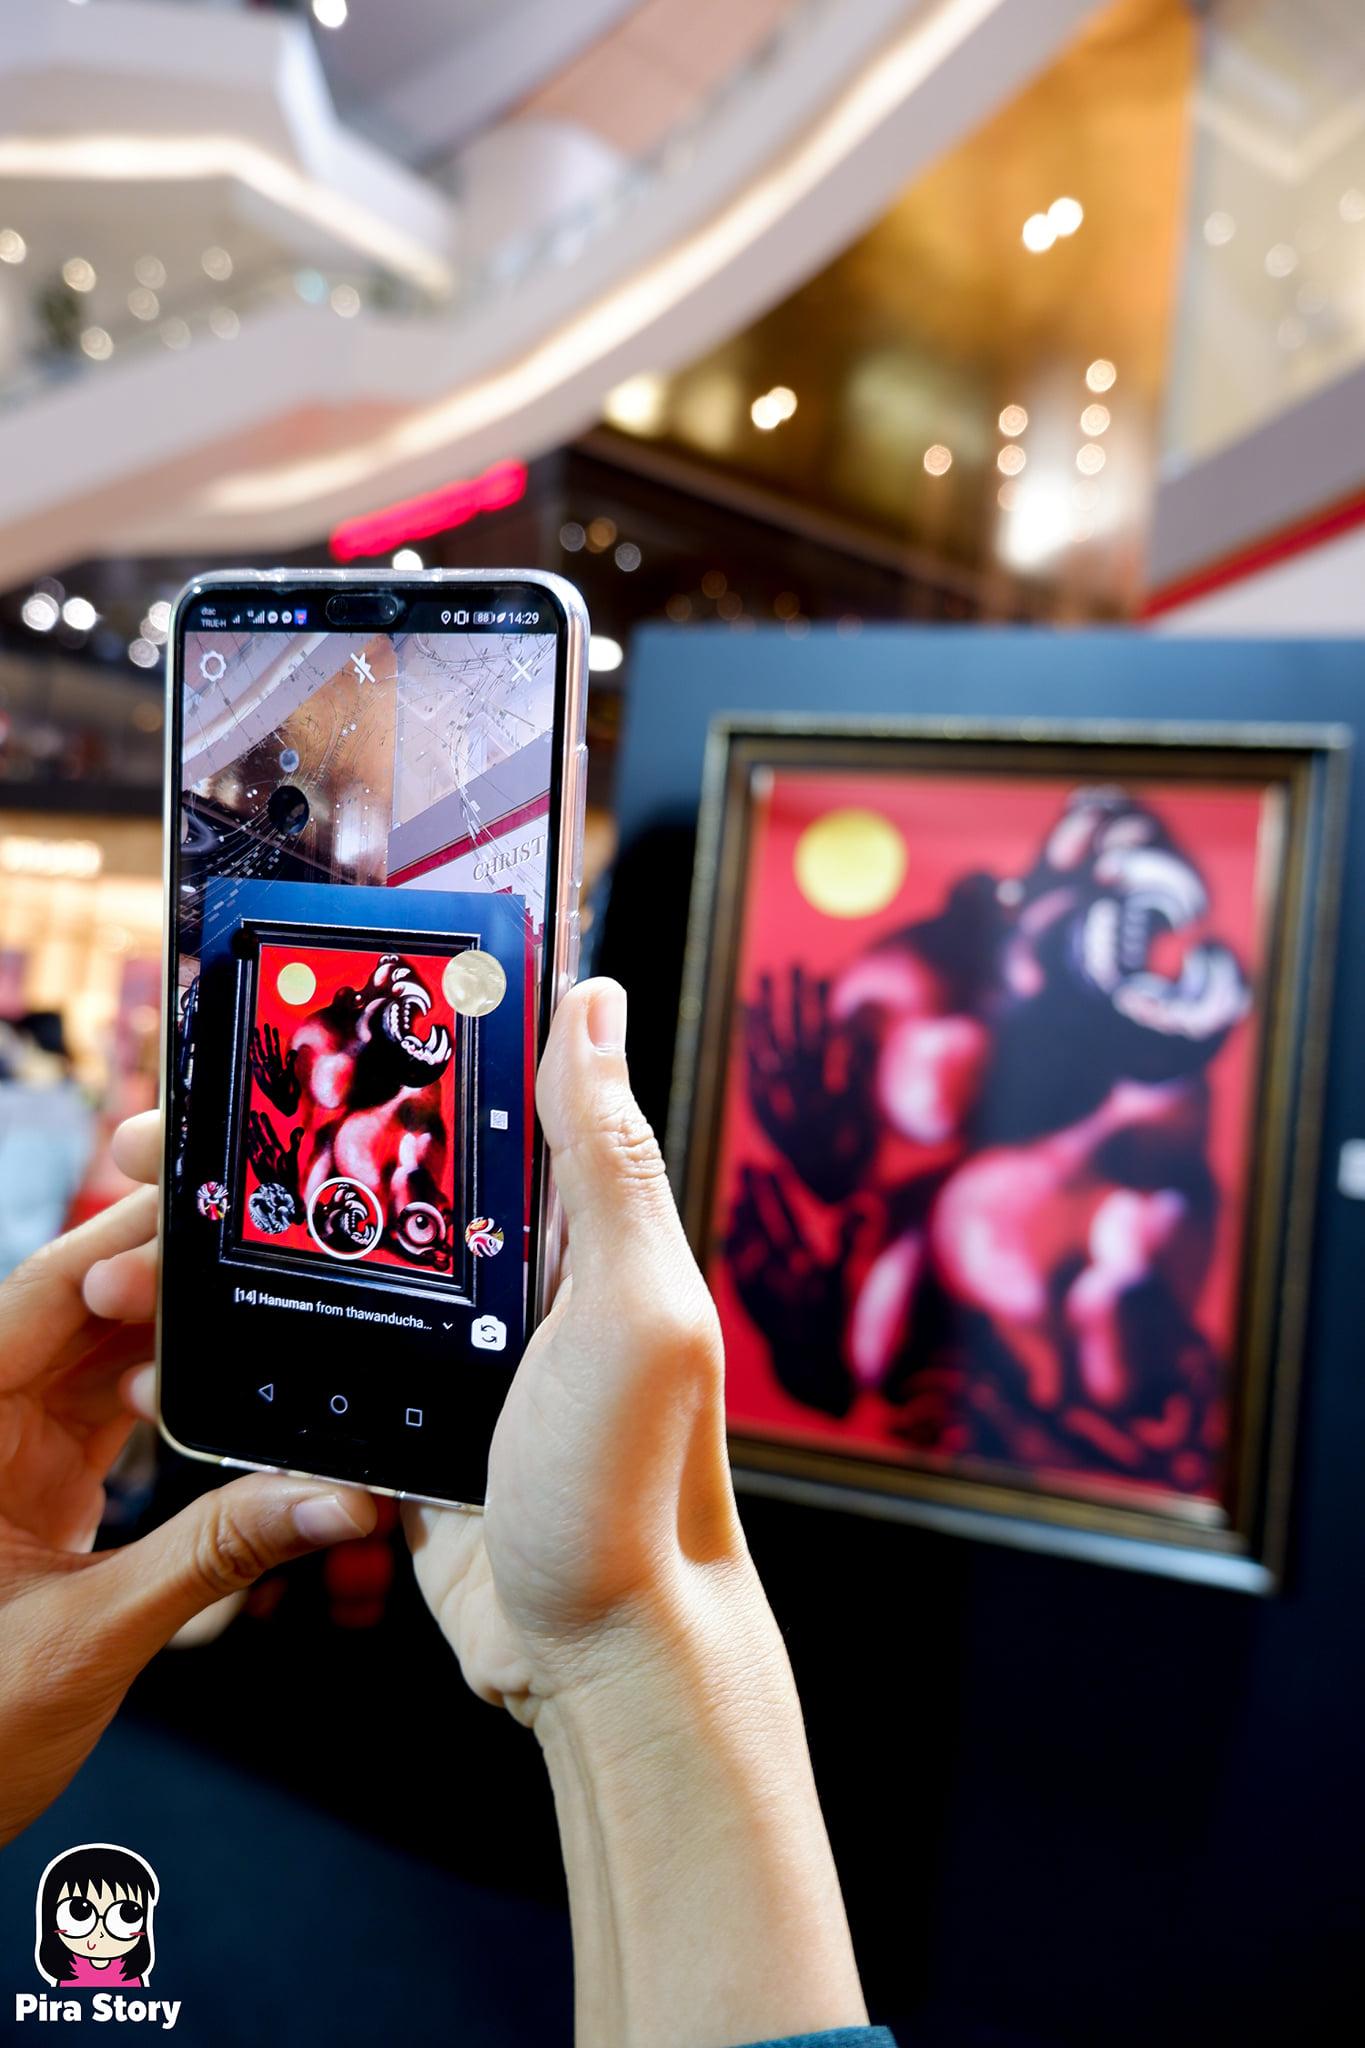 Immersive Art of Thawan Duchanee งานศิลปะ ถวัลย์ ดัชนี ไอคอนสยาม iconsiam นิทรรศการ AR